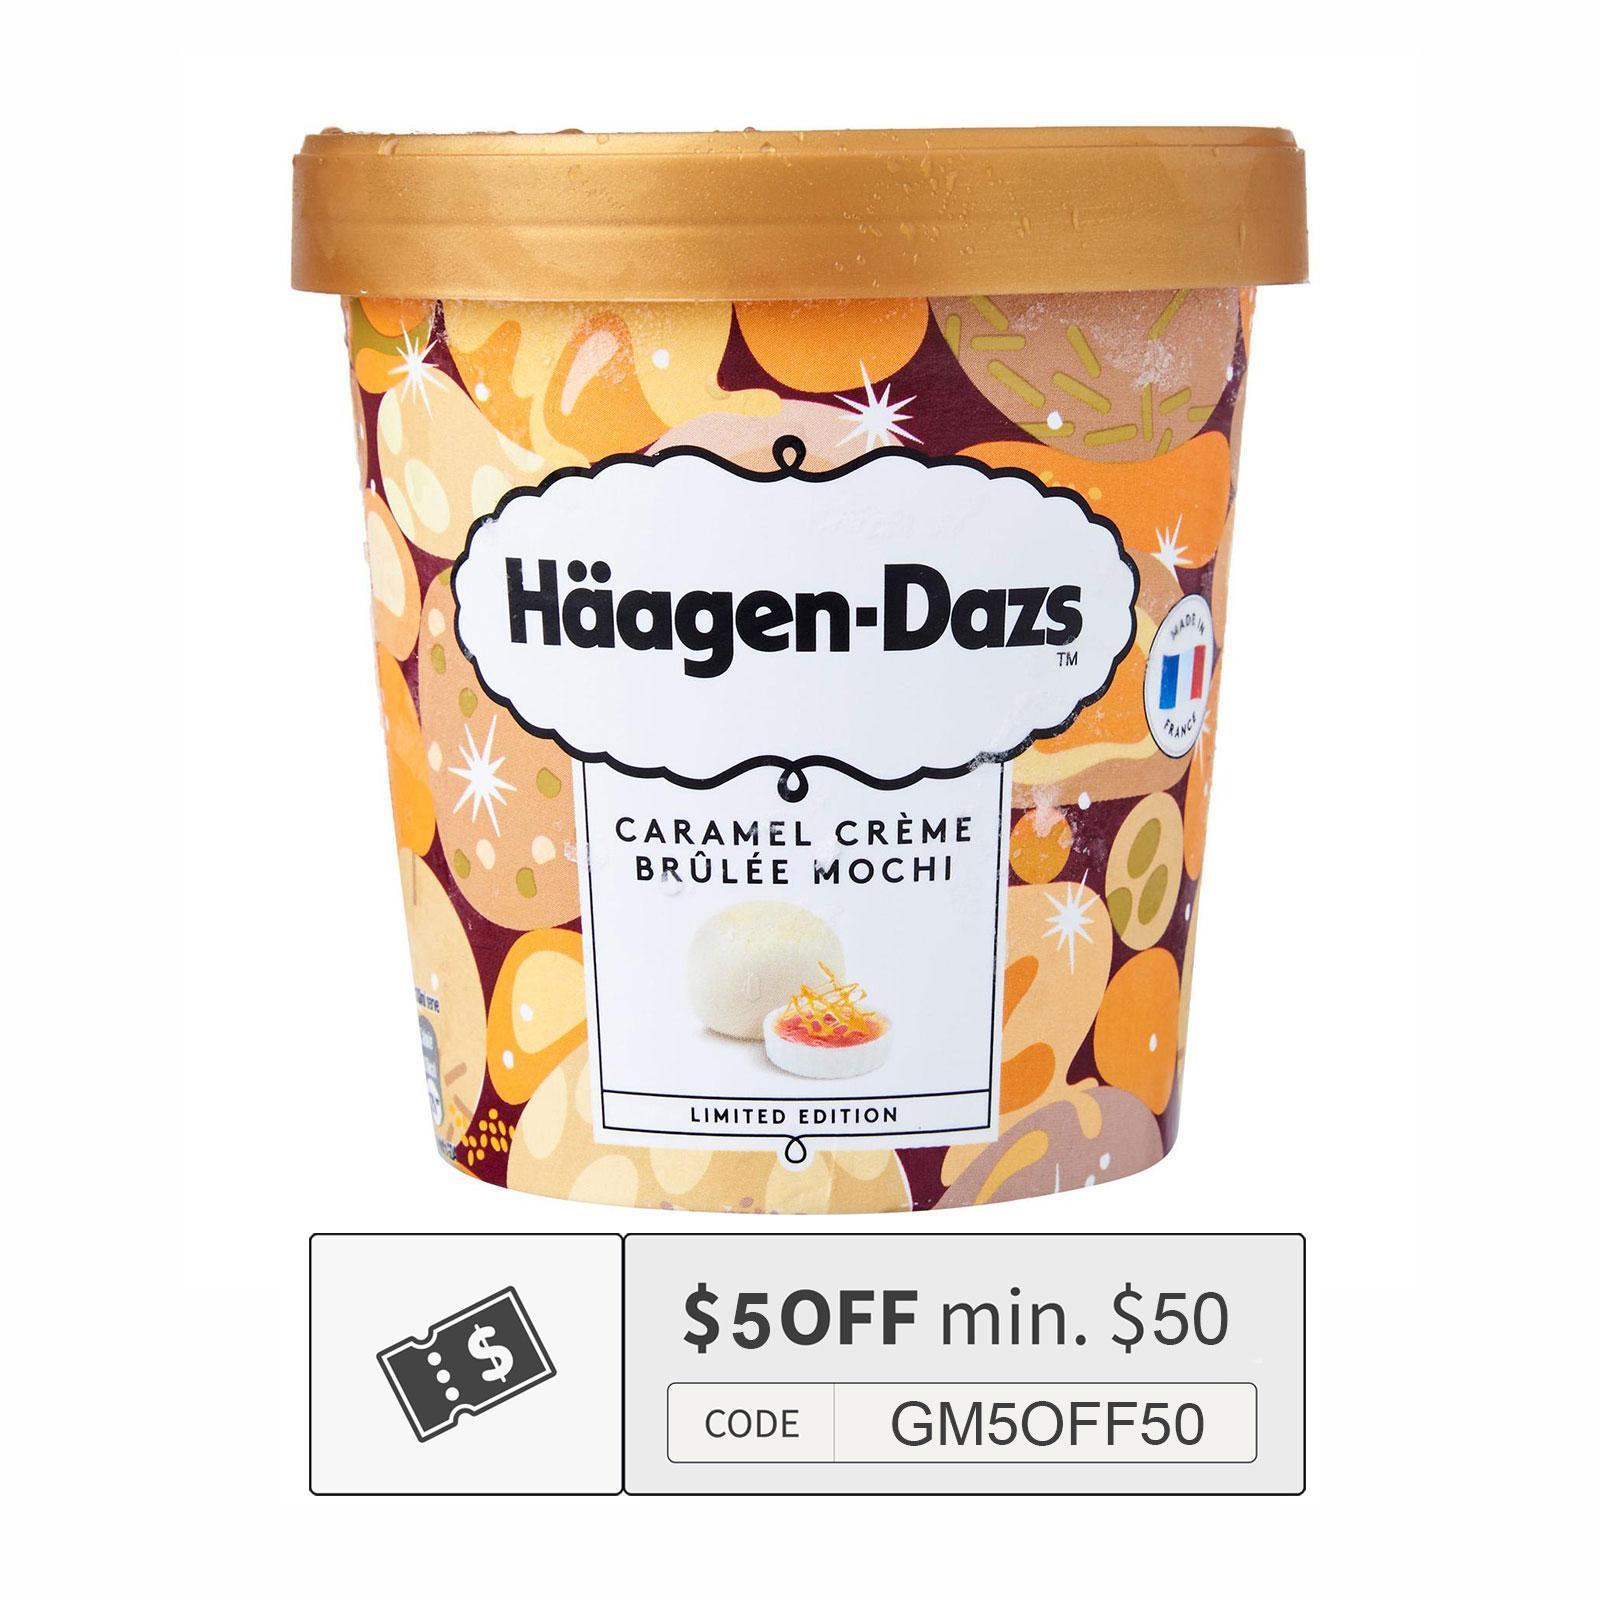 Haagen-Dazs Caramel Creme Brulee Mochi Ice Cream